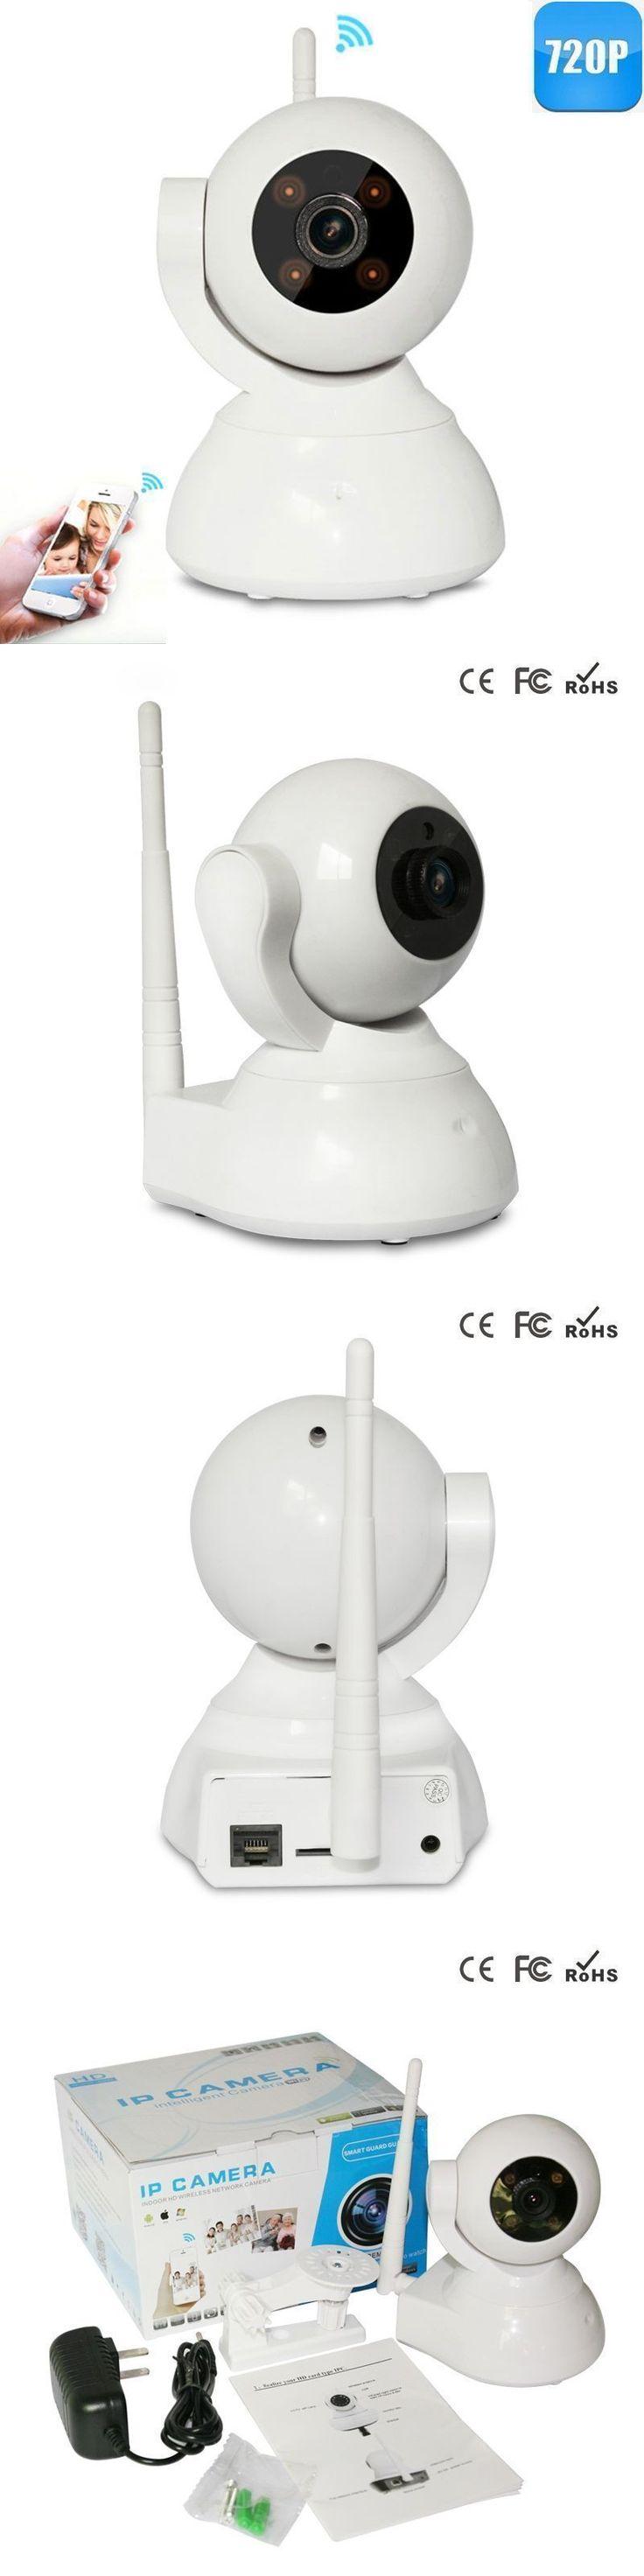 Woshijia 2016 New 720P Mini WIFI IP Camera Wireless Alarm Home Security CCTV Camera Surveillance with Night Vision